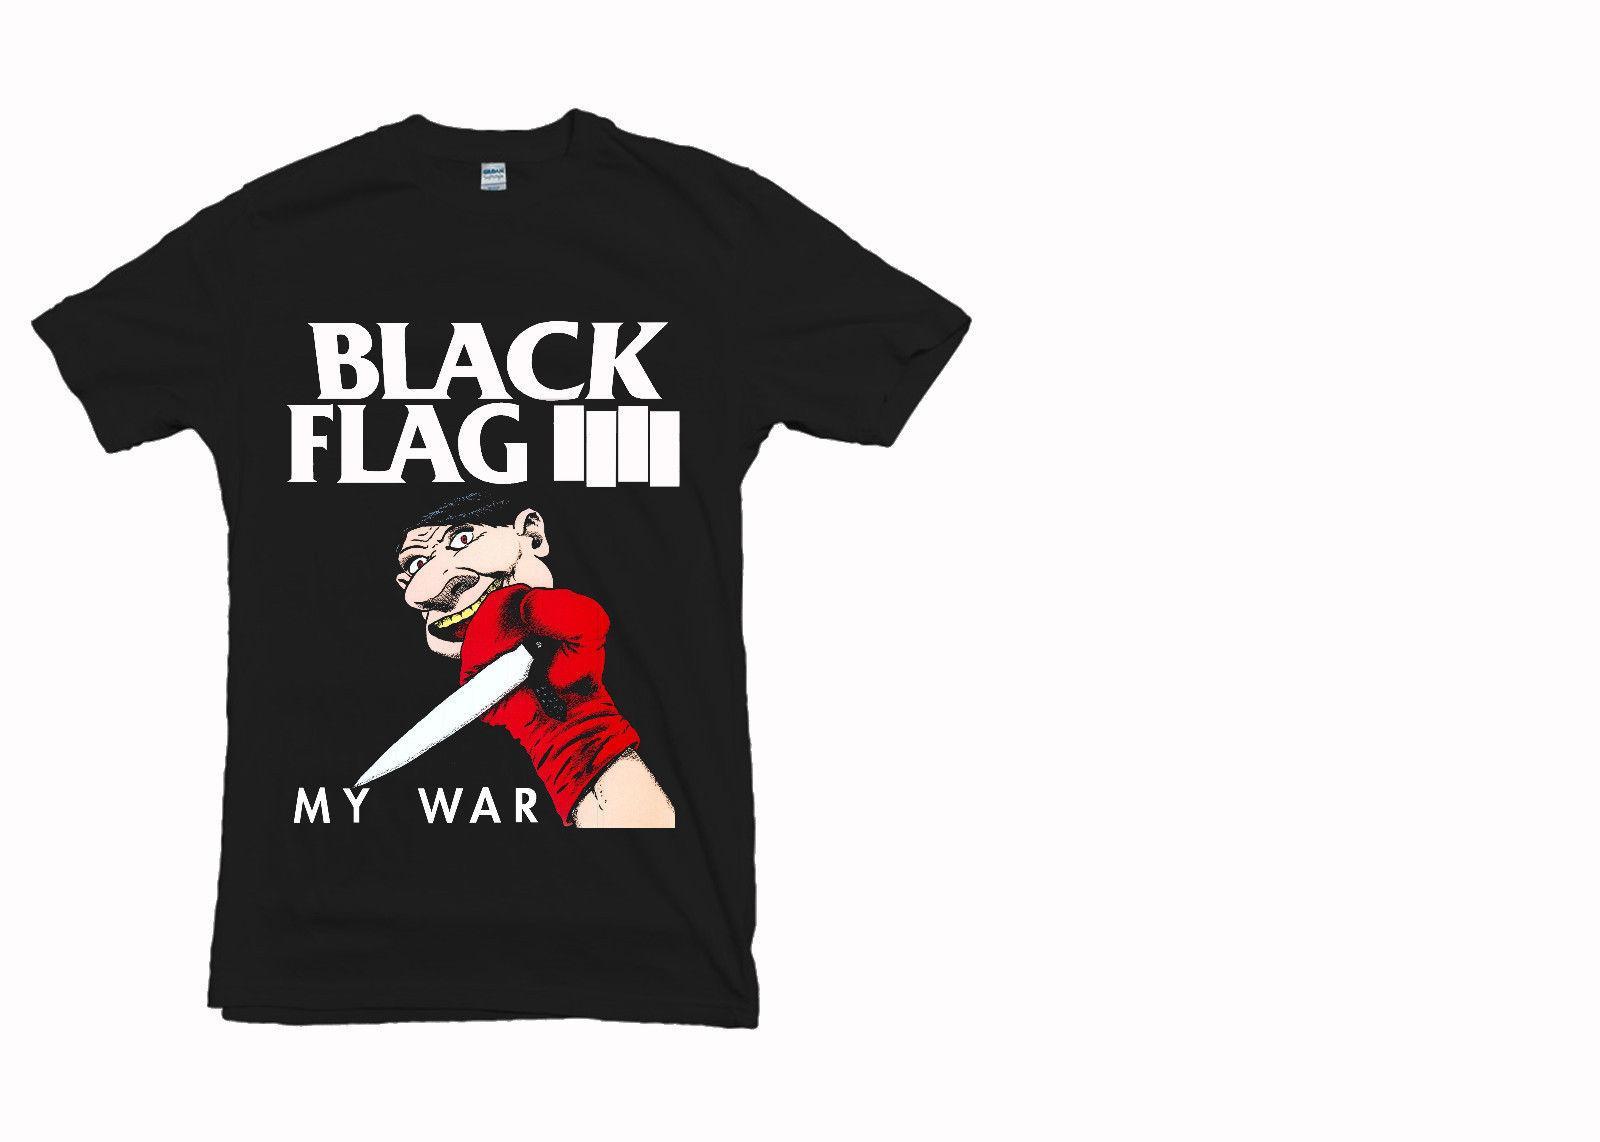 d36f5a9a T Shirt Black Flag Band Series My War Gildan Men'S Clothing Black Size S  2XL But T Shirts T Shirts Funky From Designtshirts201806, $10.66  DHgate.Com